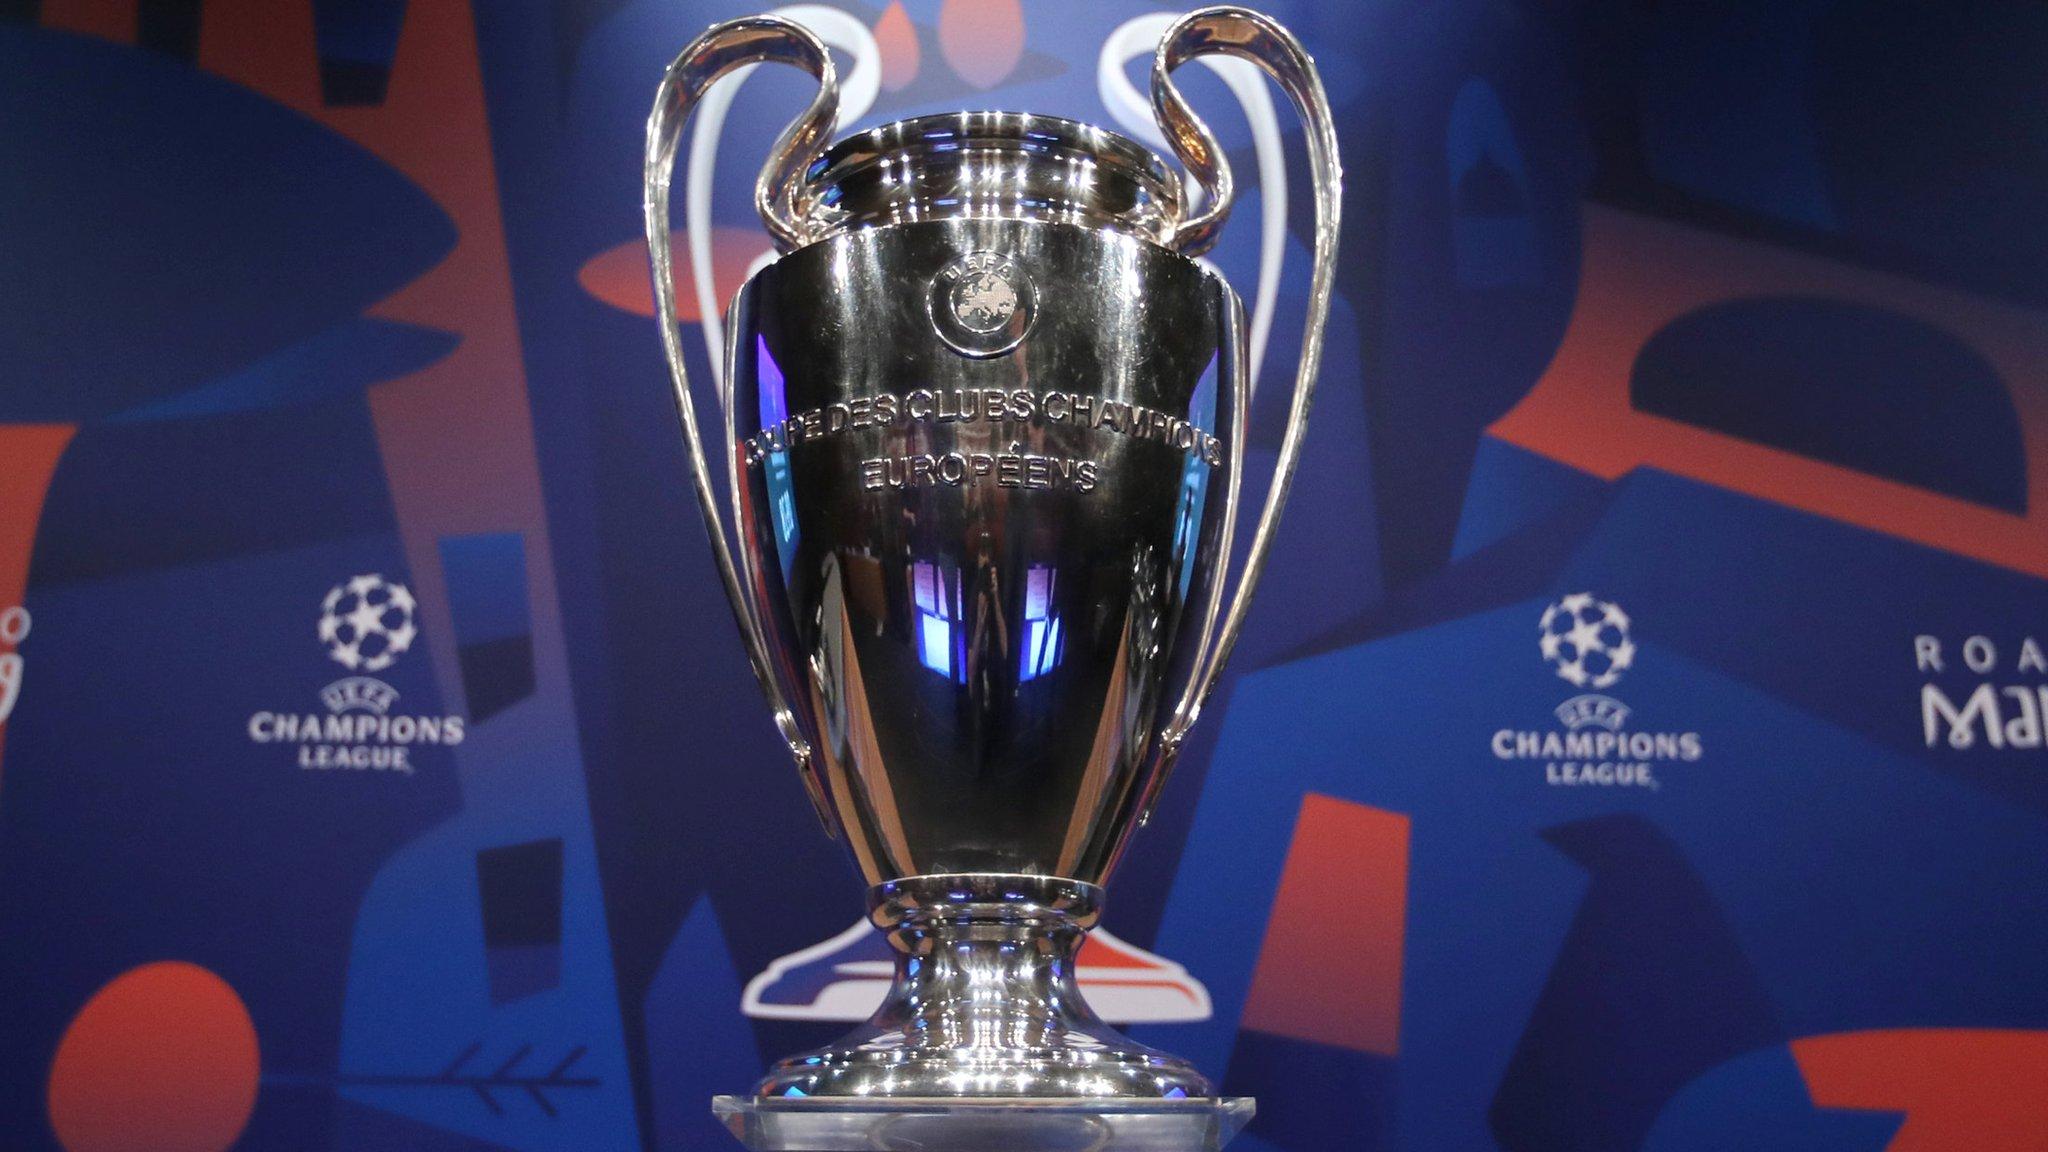 Champions League guide: Liverpool, Man City, Man Utd & Tottenham in last 16